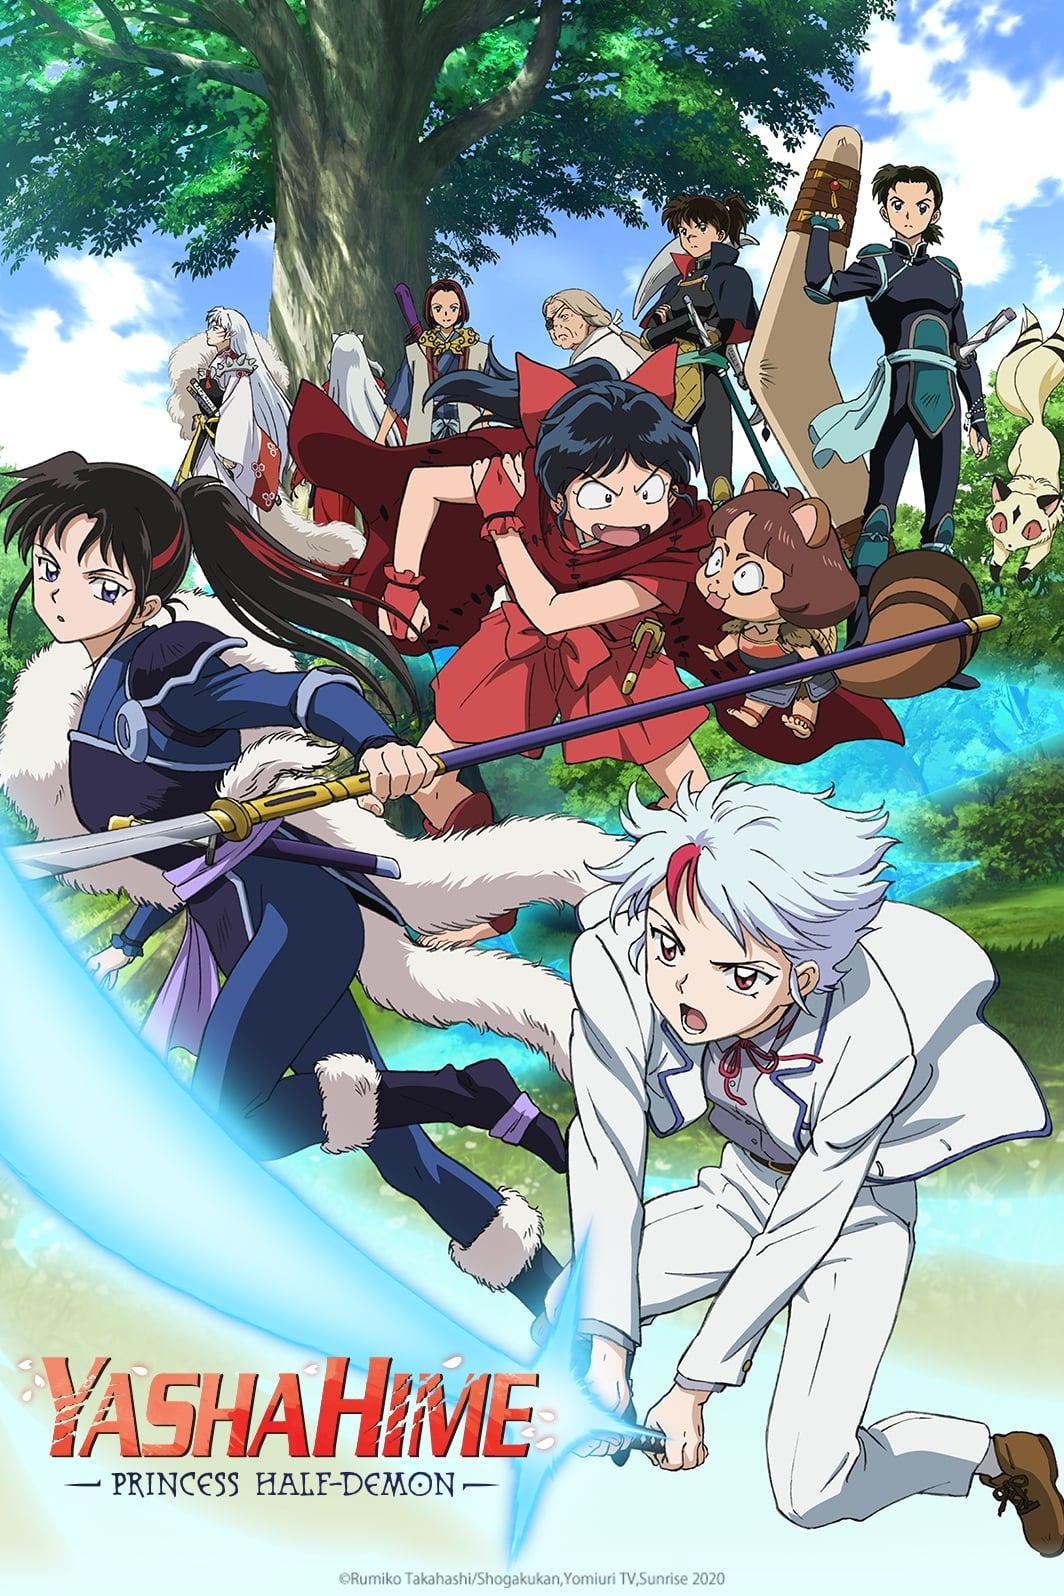 Yashahime: Princess Half-Demon Season 1